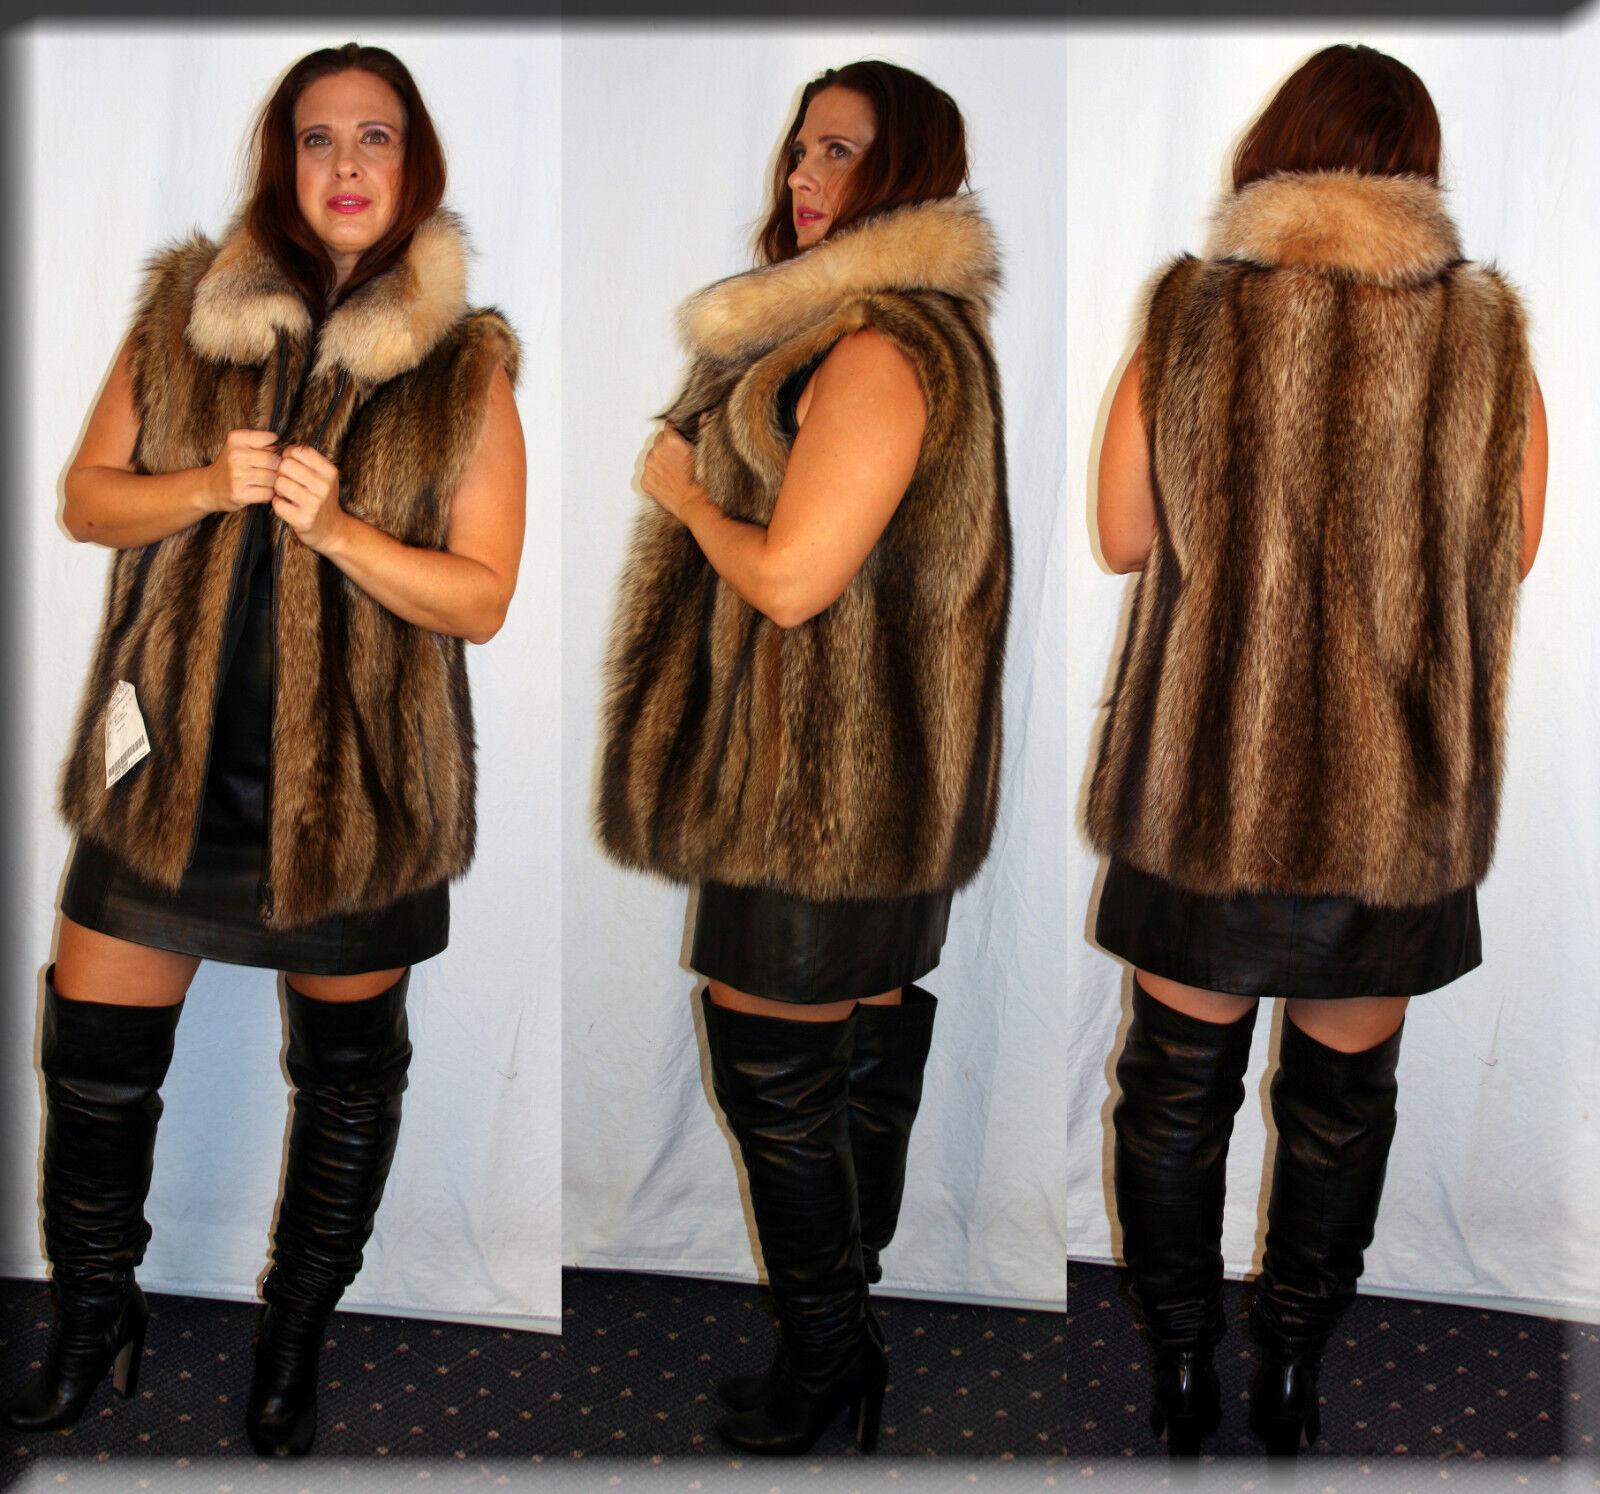 New Raccoon Fur Vest Crystal Fox Fur Trim Medium, Large and Extra Large